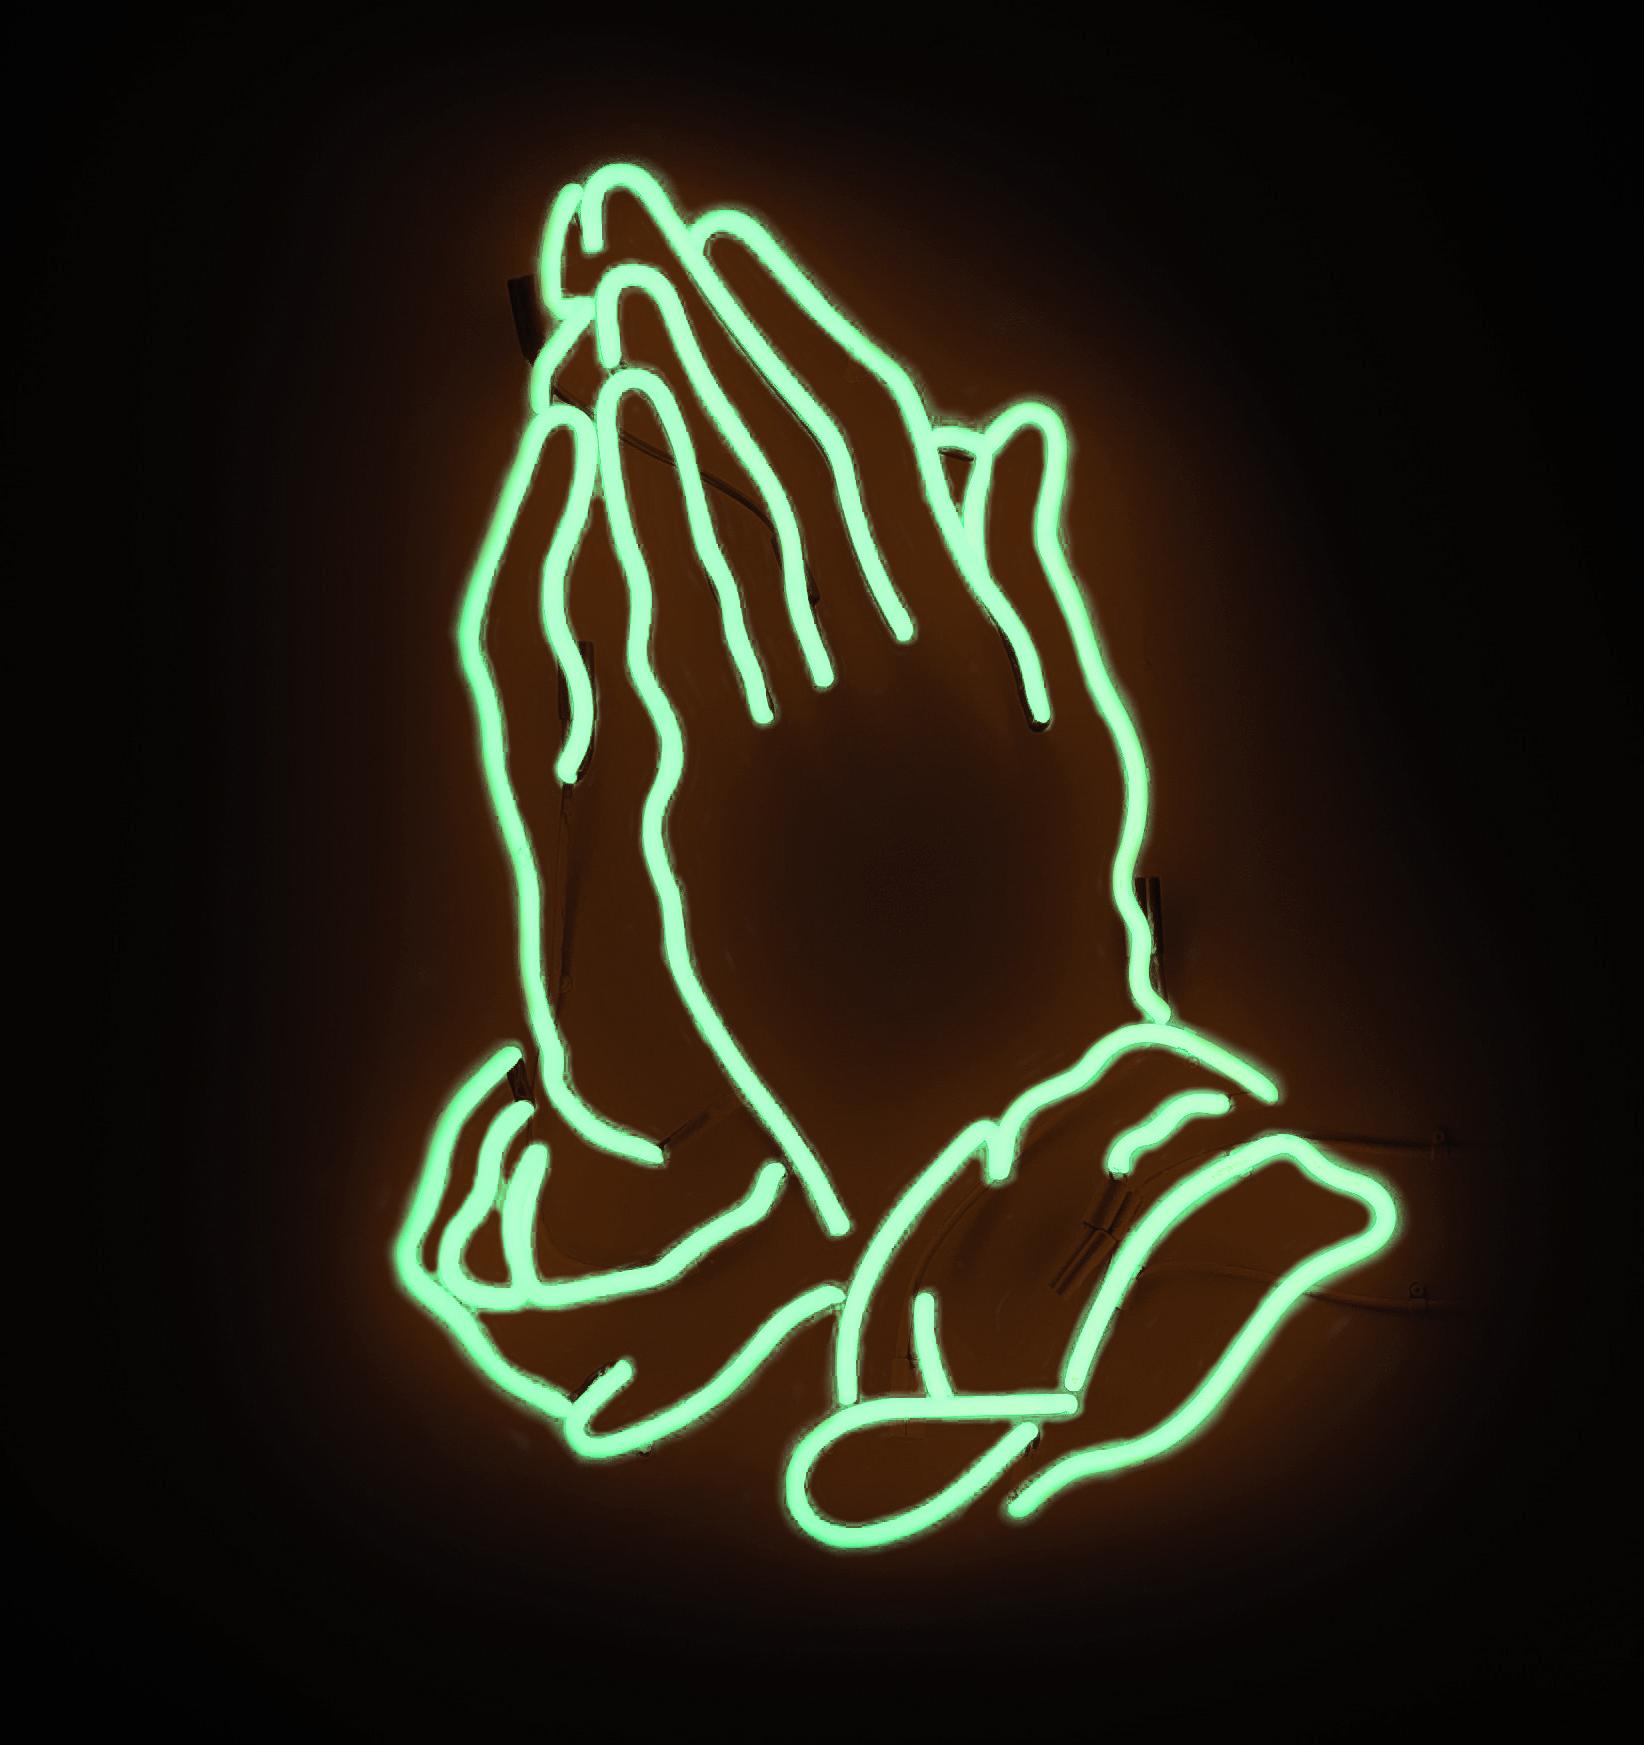 pray-image.jpg